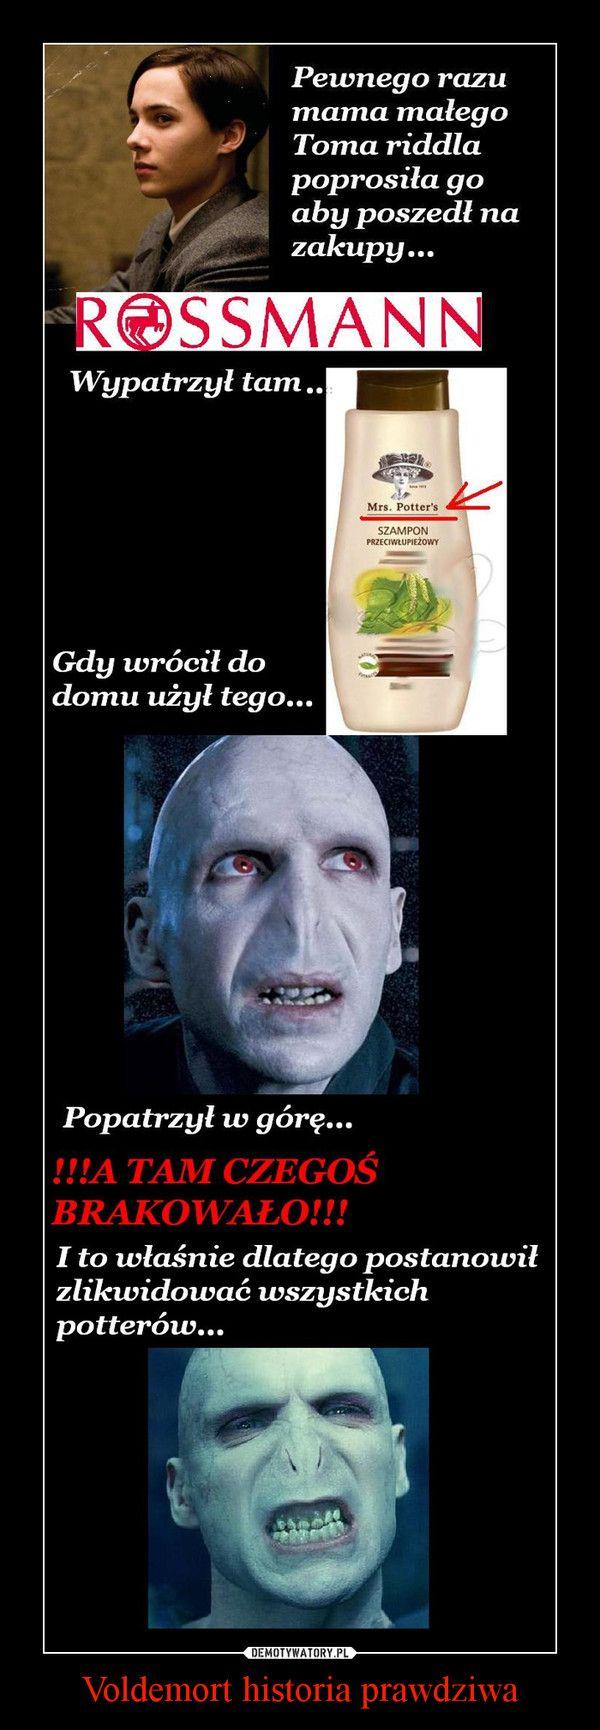 Voldemort historia prawdziwa –